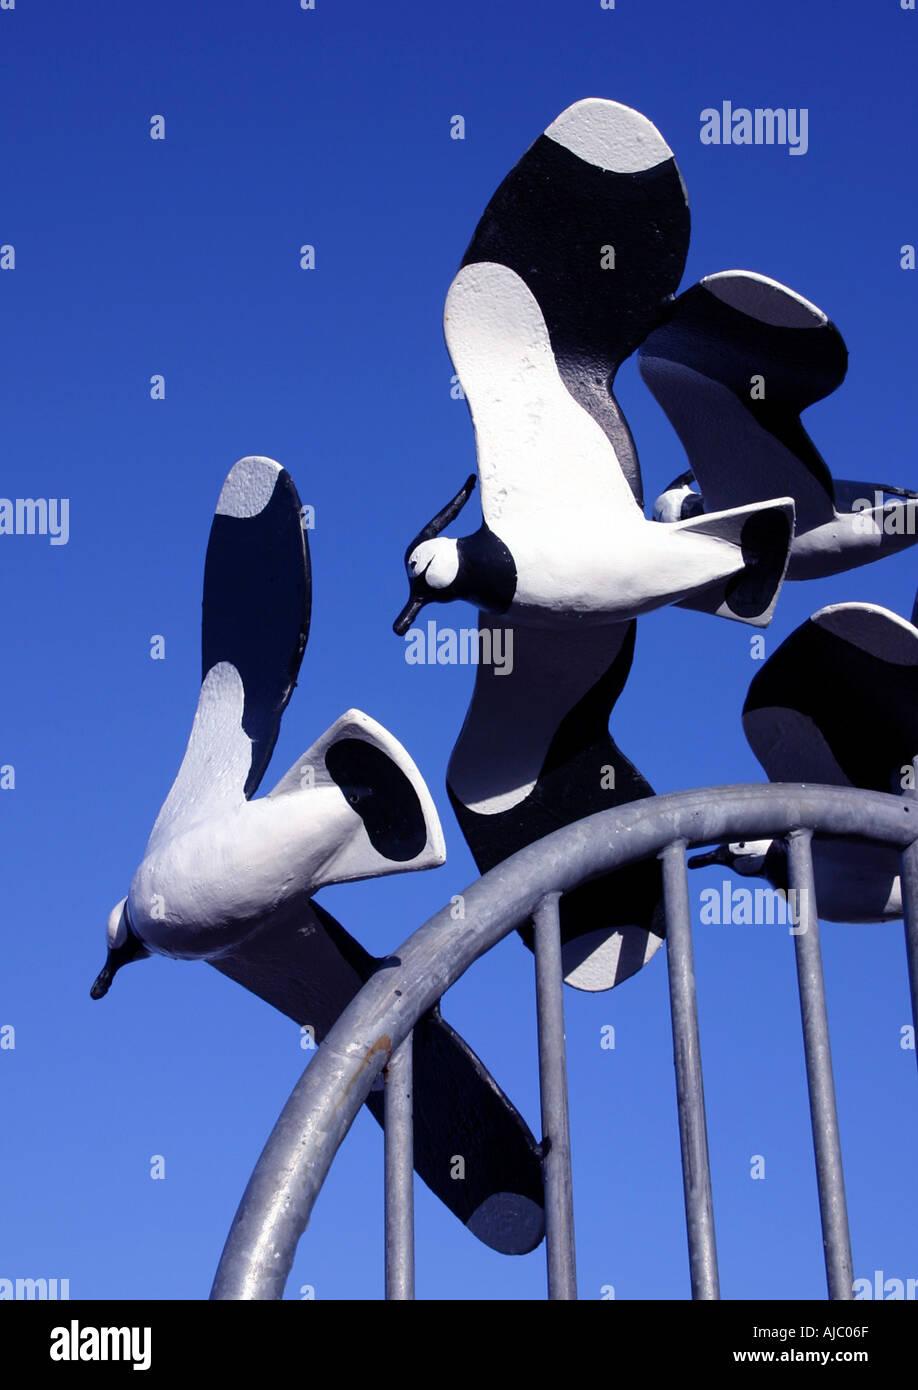 Bird sculpture on promenade Morecambe - Stock Image